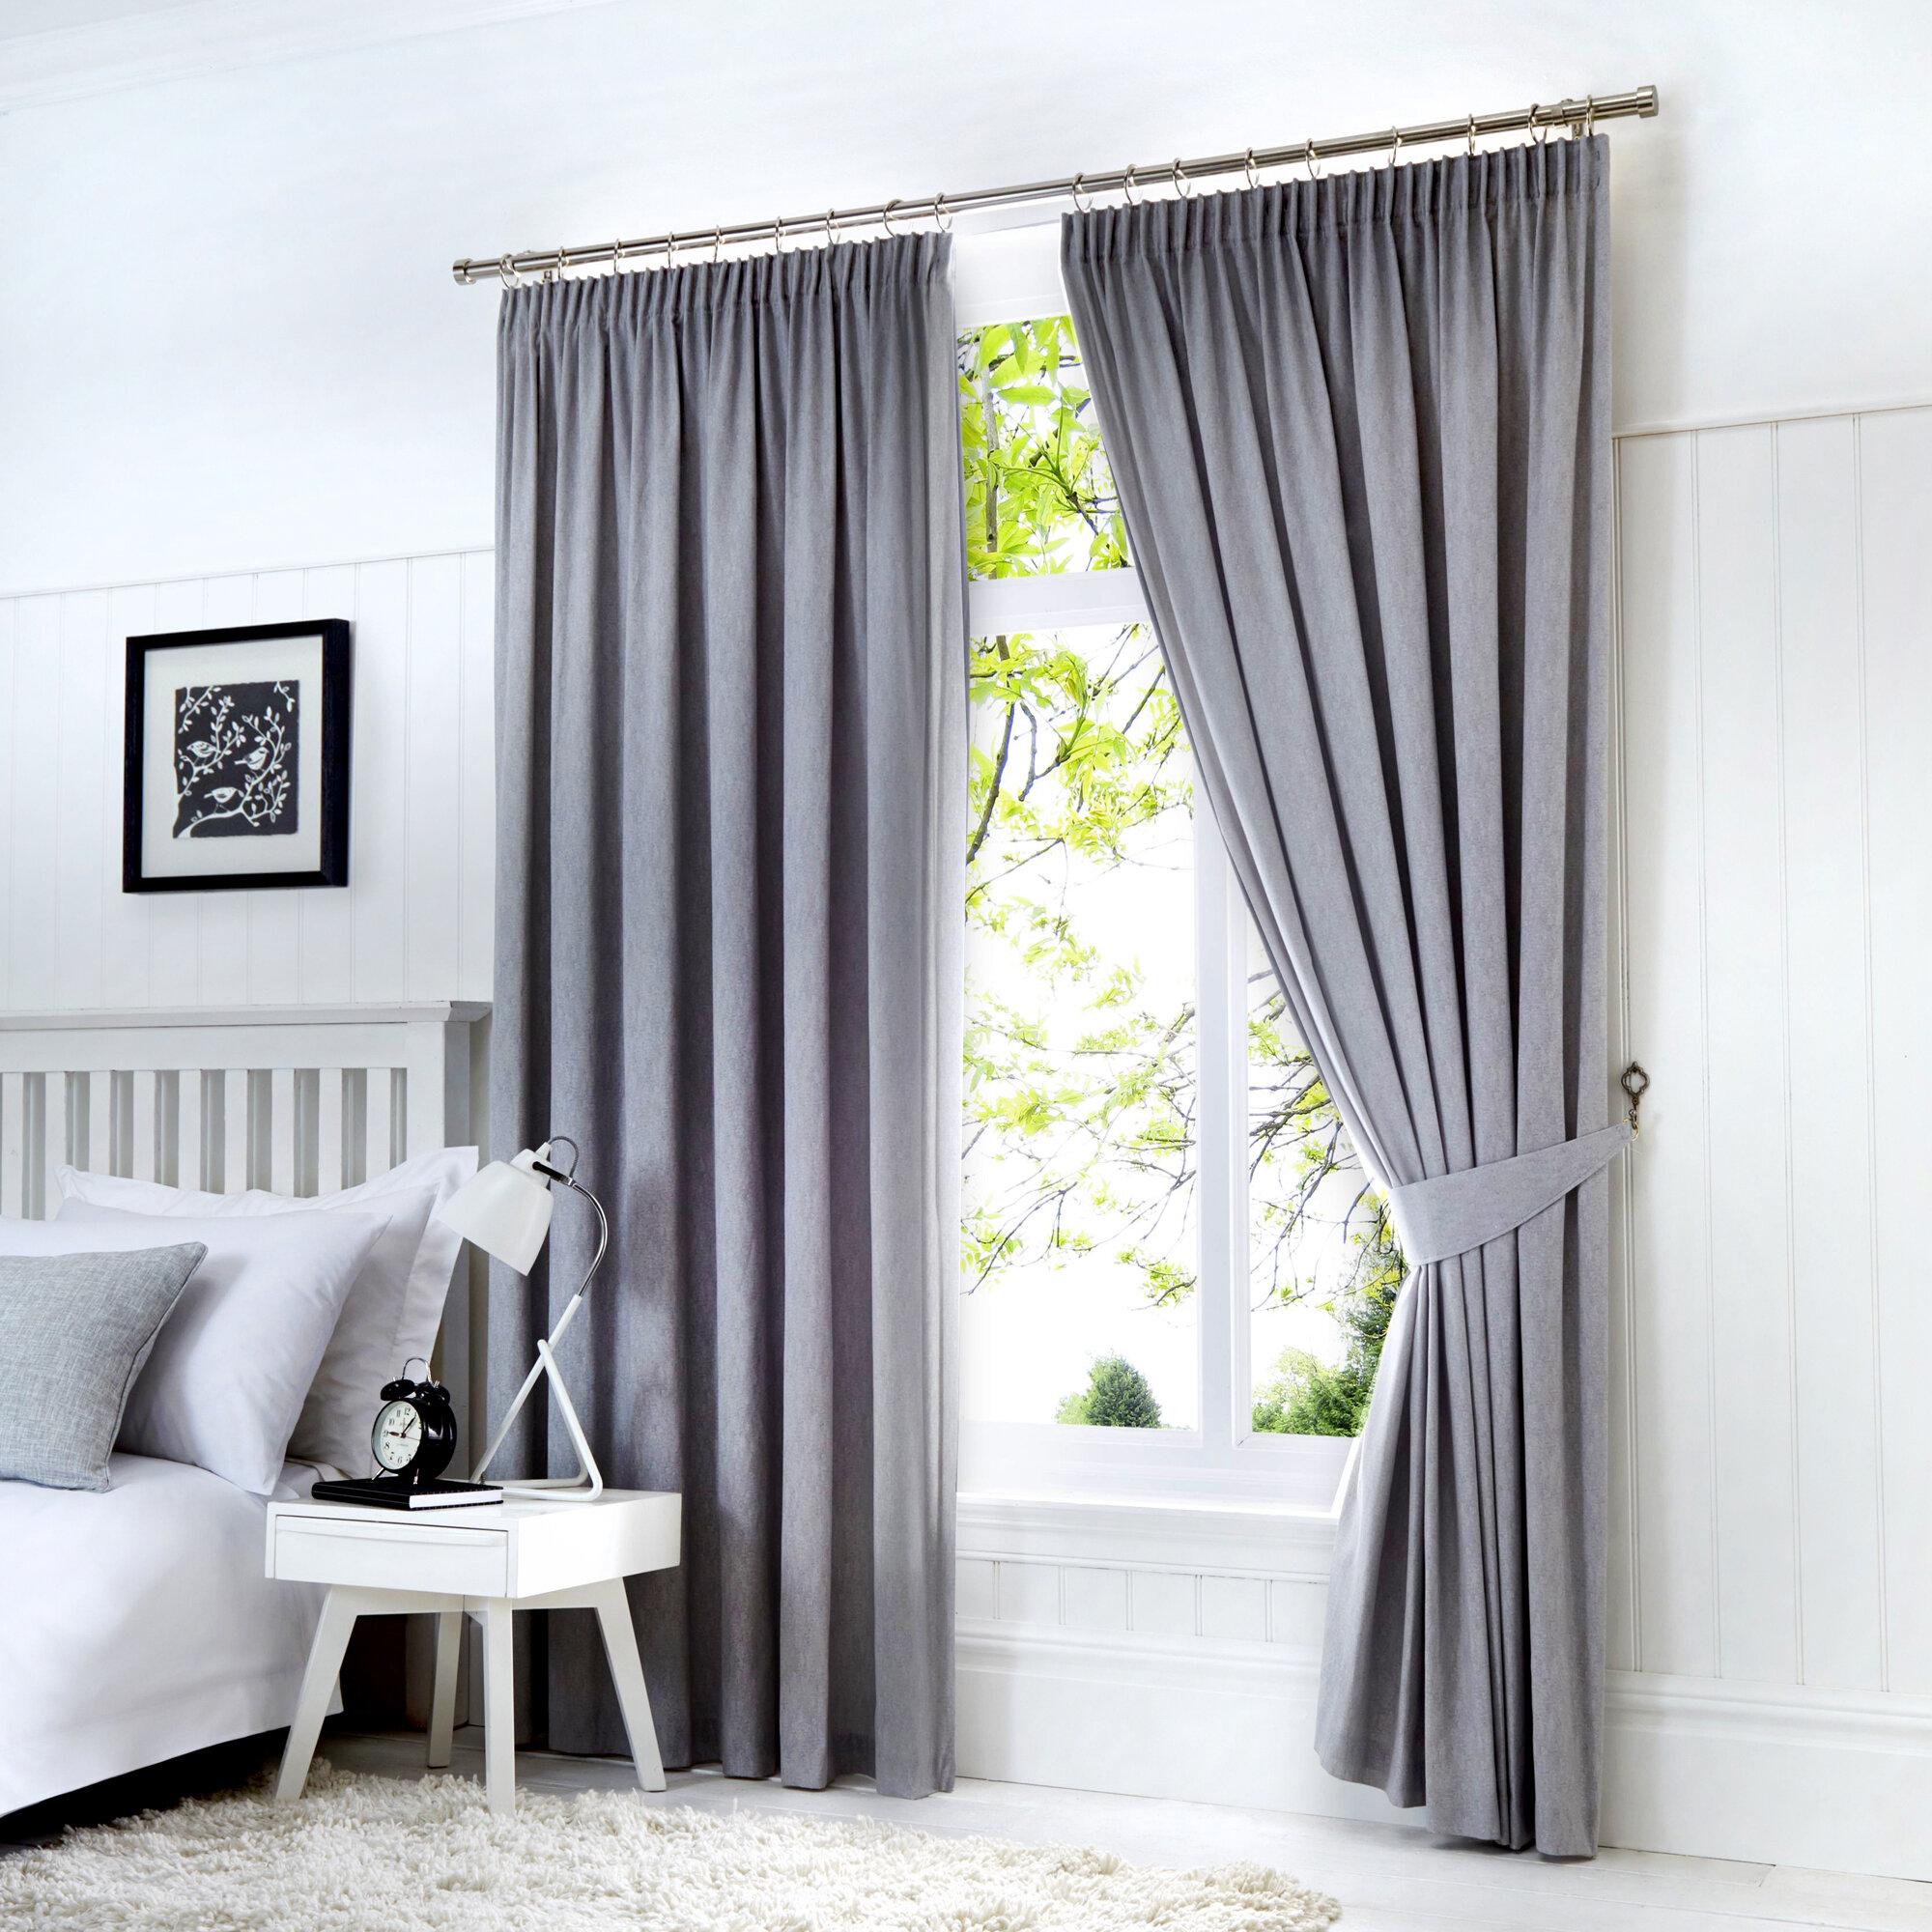 Bedroom Curtains Curtains You Ll Love Wayfair Co Uk